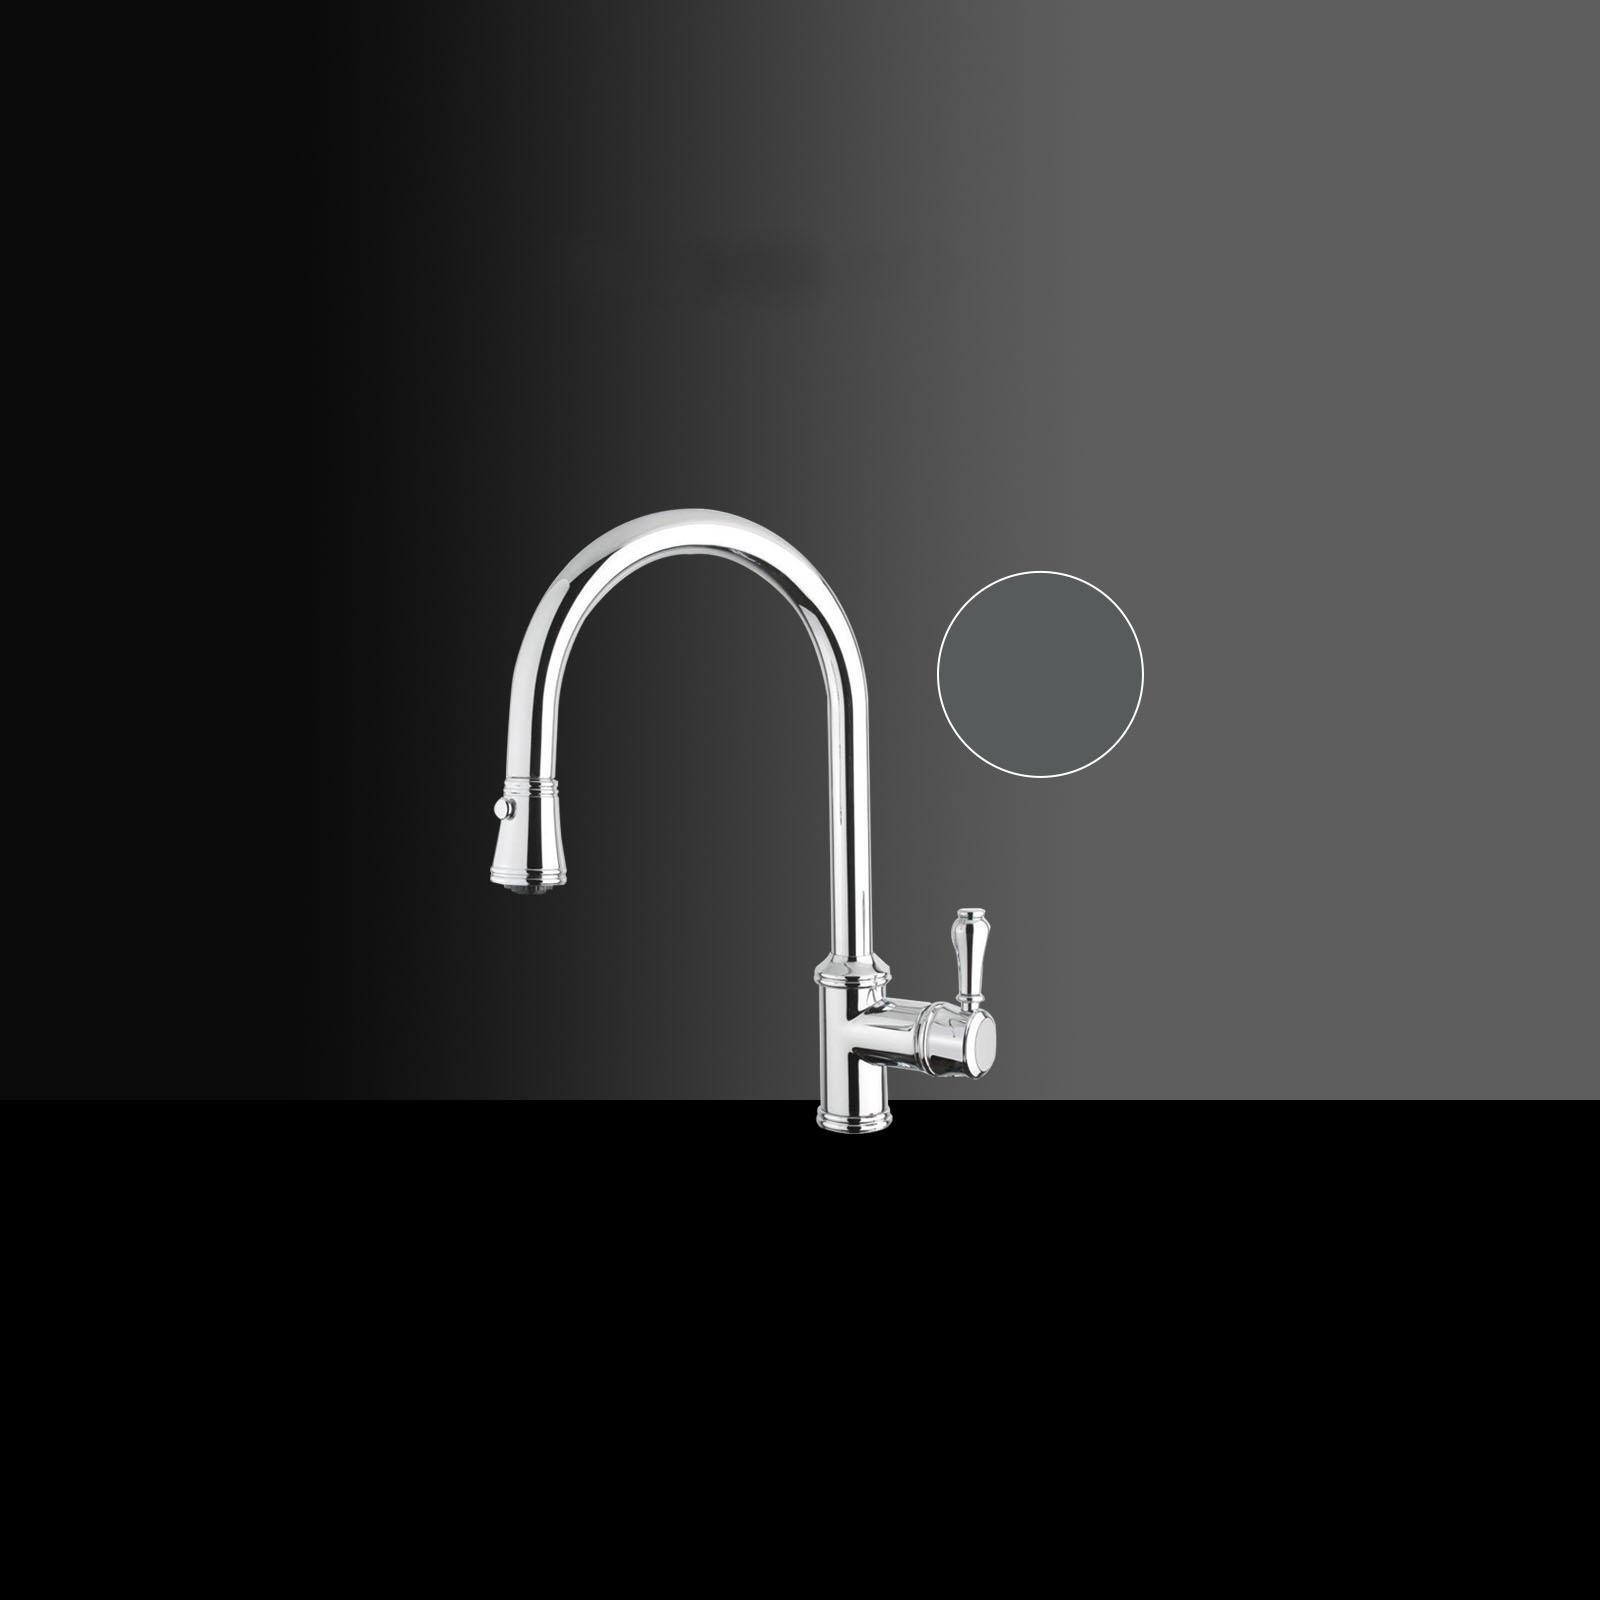 High-quality single lever tap Augustin - gun barrel